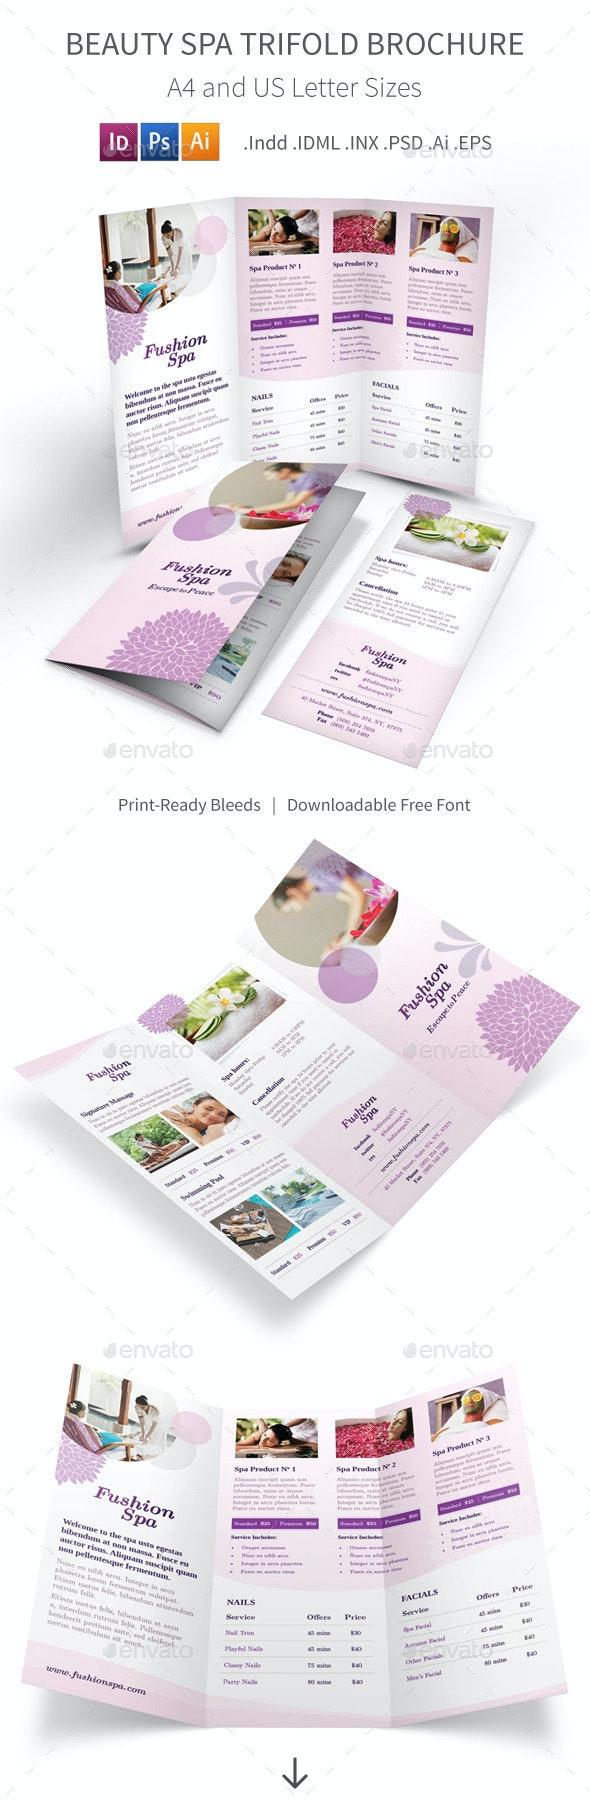 Beauty Spa Trifold Brochure - Informational Brochures